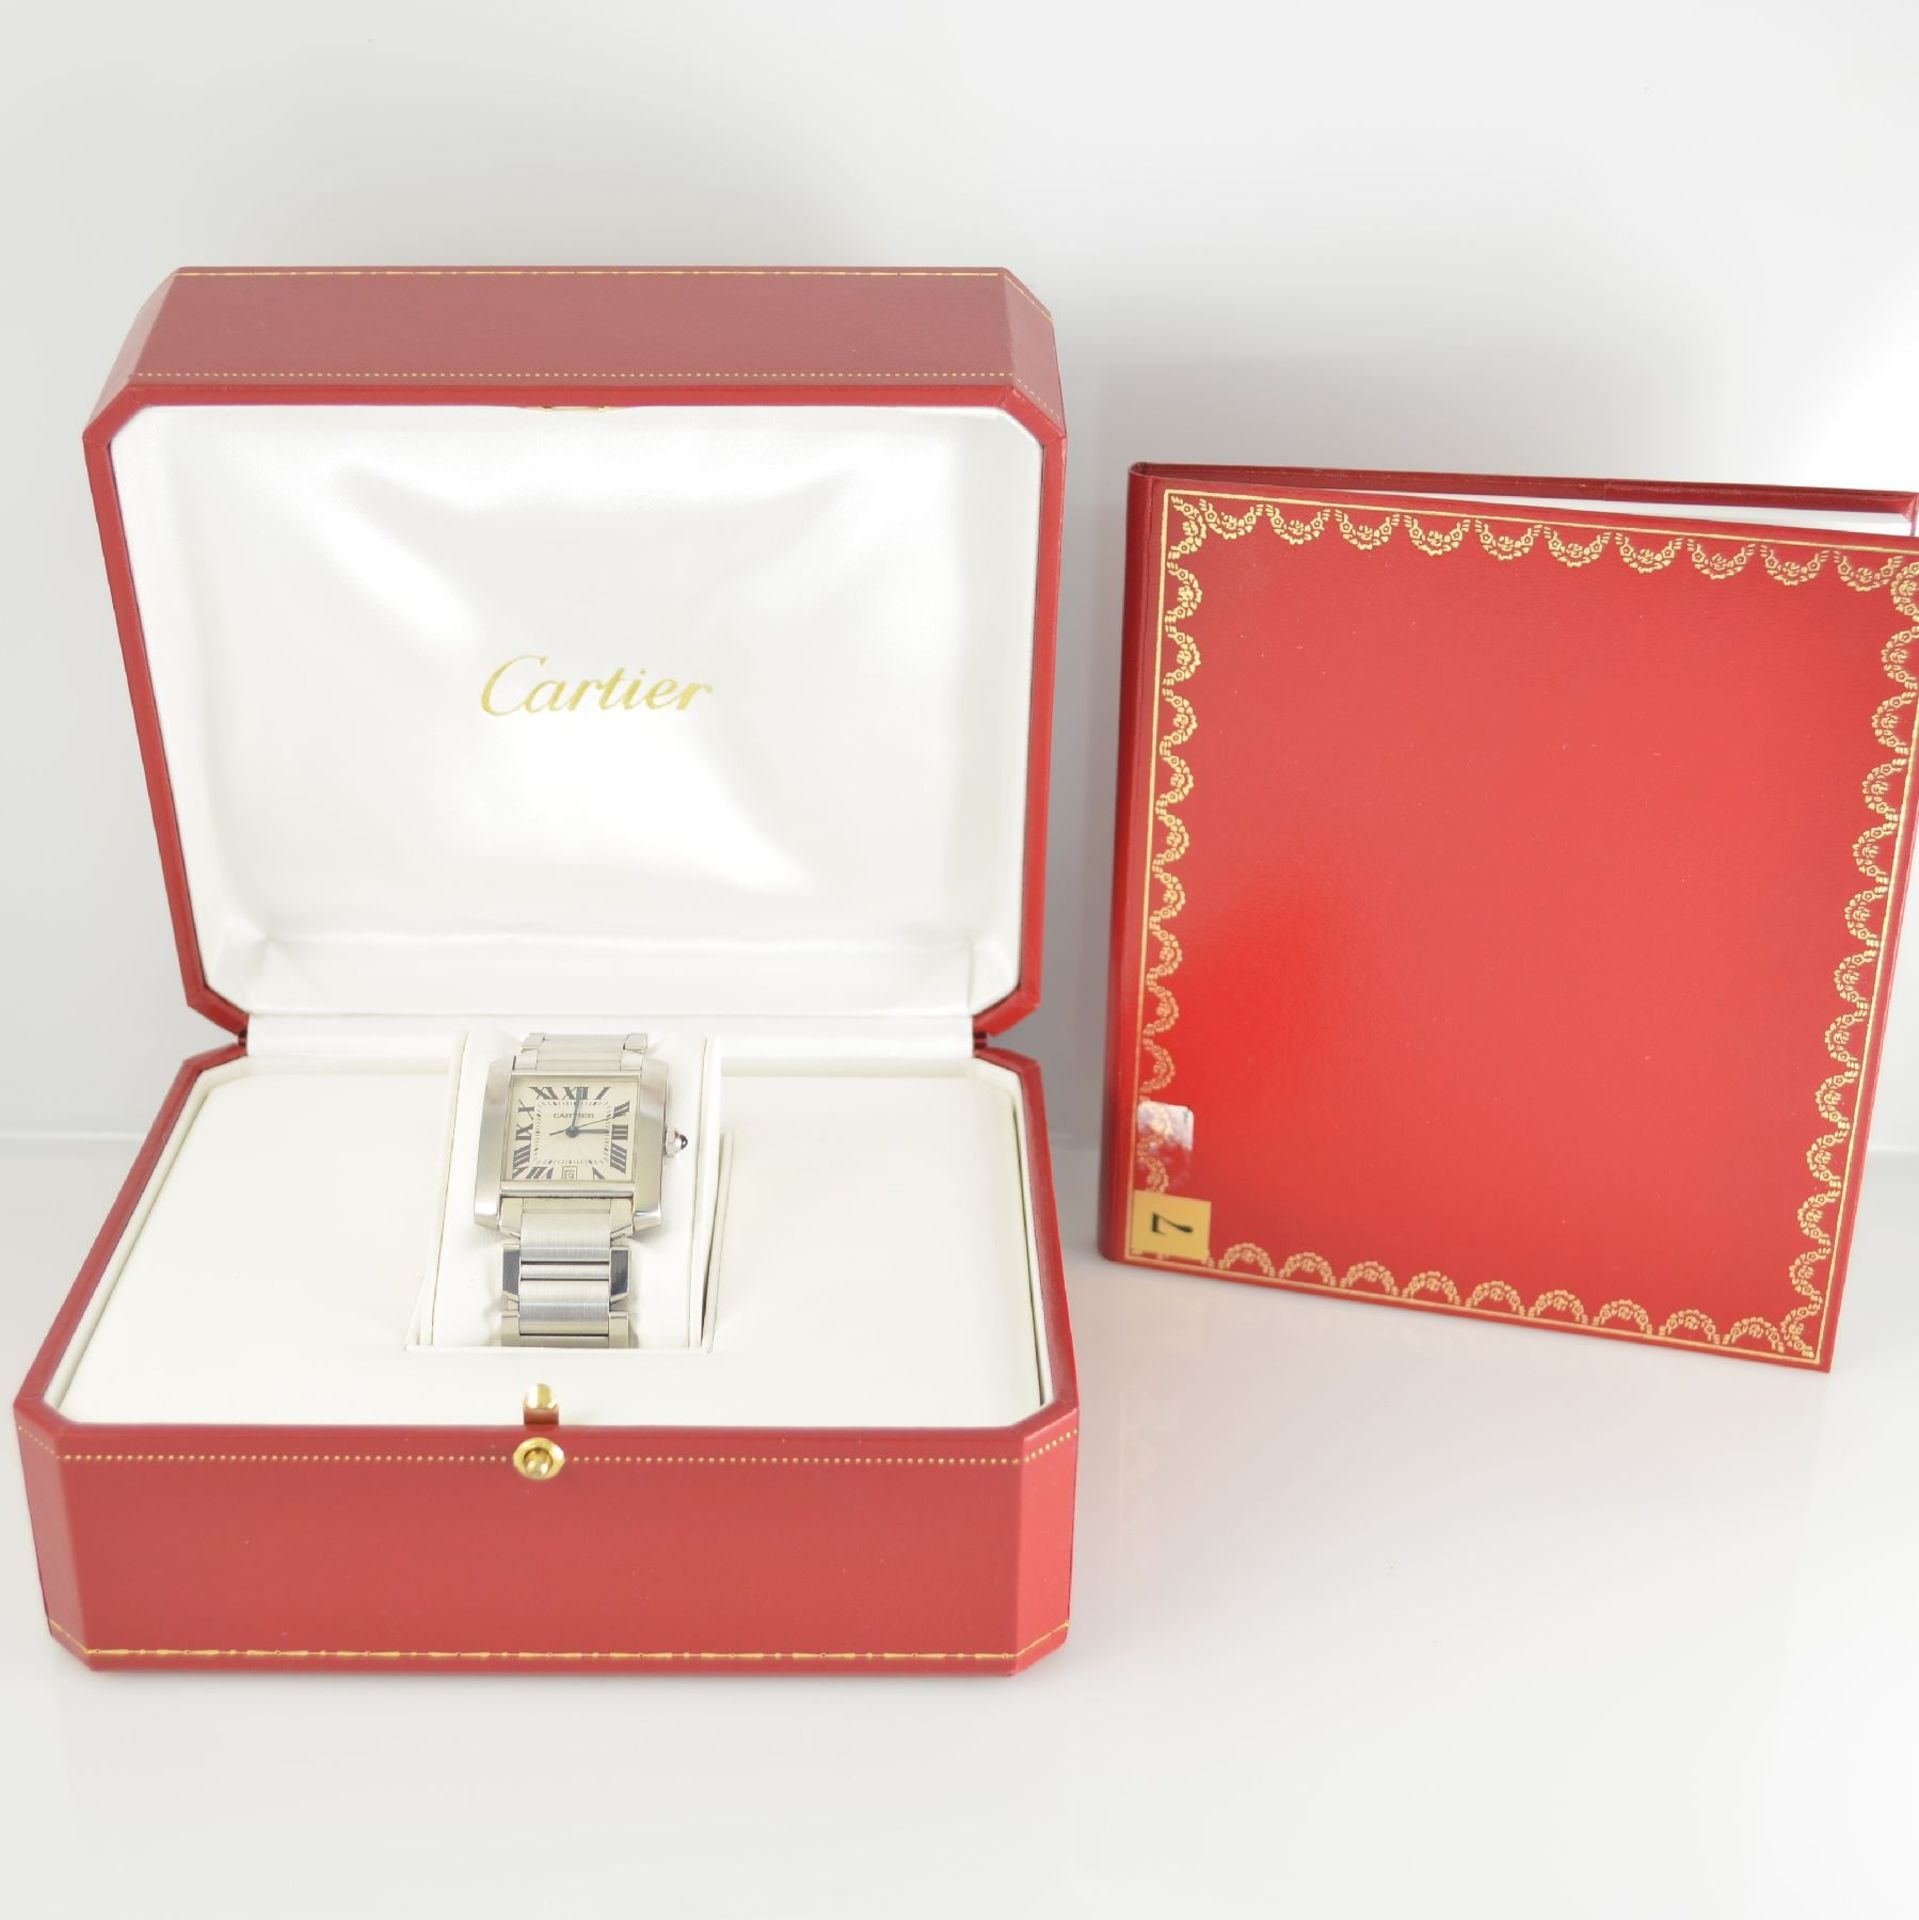 CARTIER Armbanduhr Tank Francaise, Automatik, Ref. 2302, Edelstahlgeh. inkl. Gliederband m. dopp. - Bild 8 aus 8